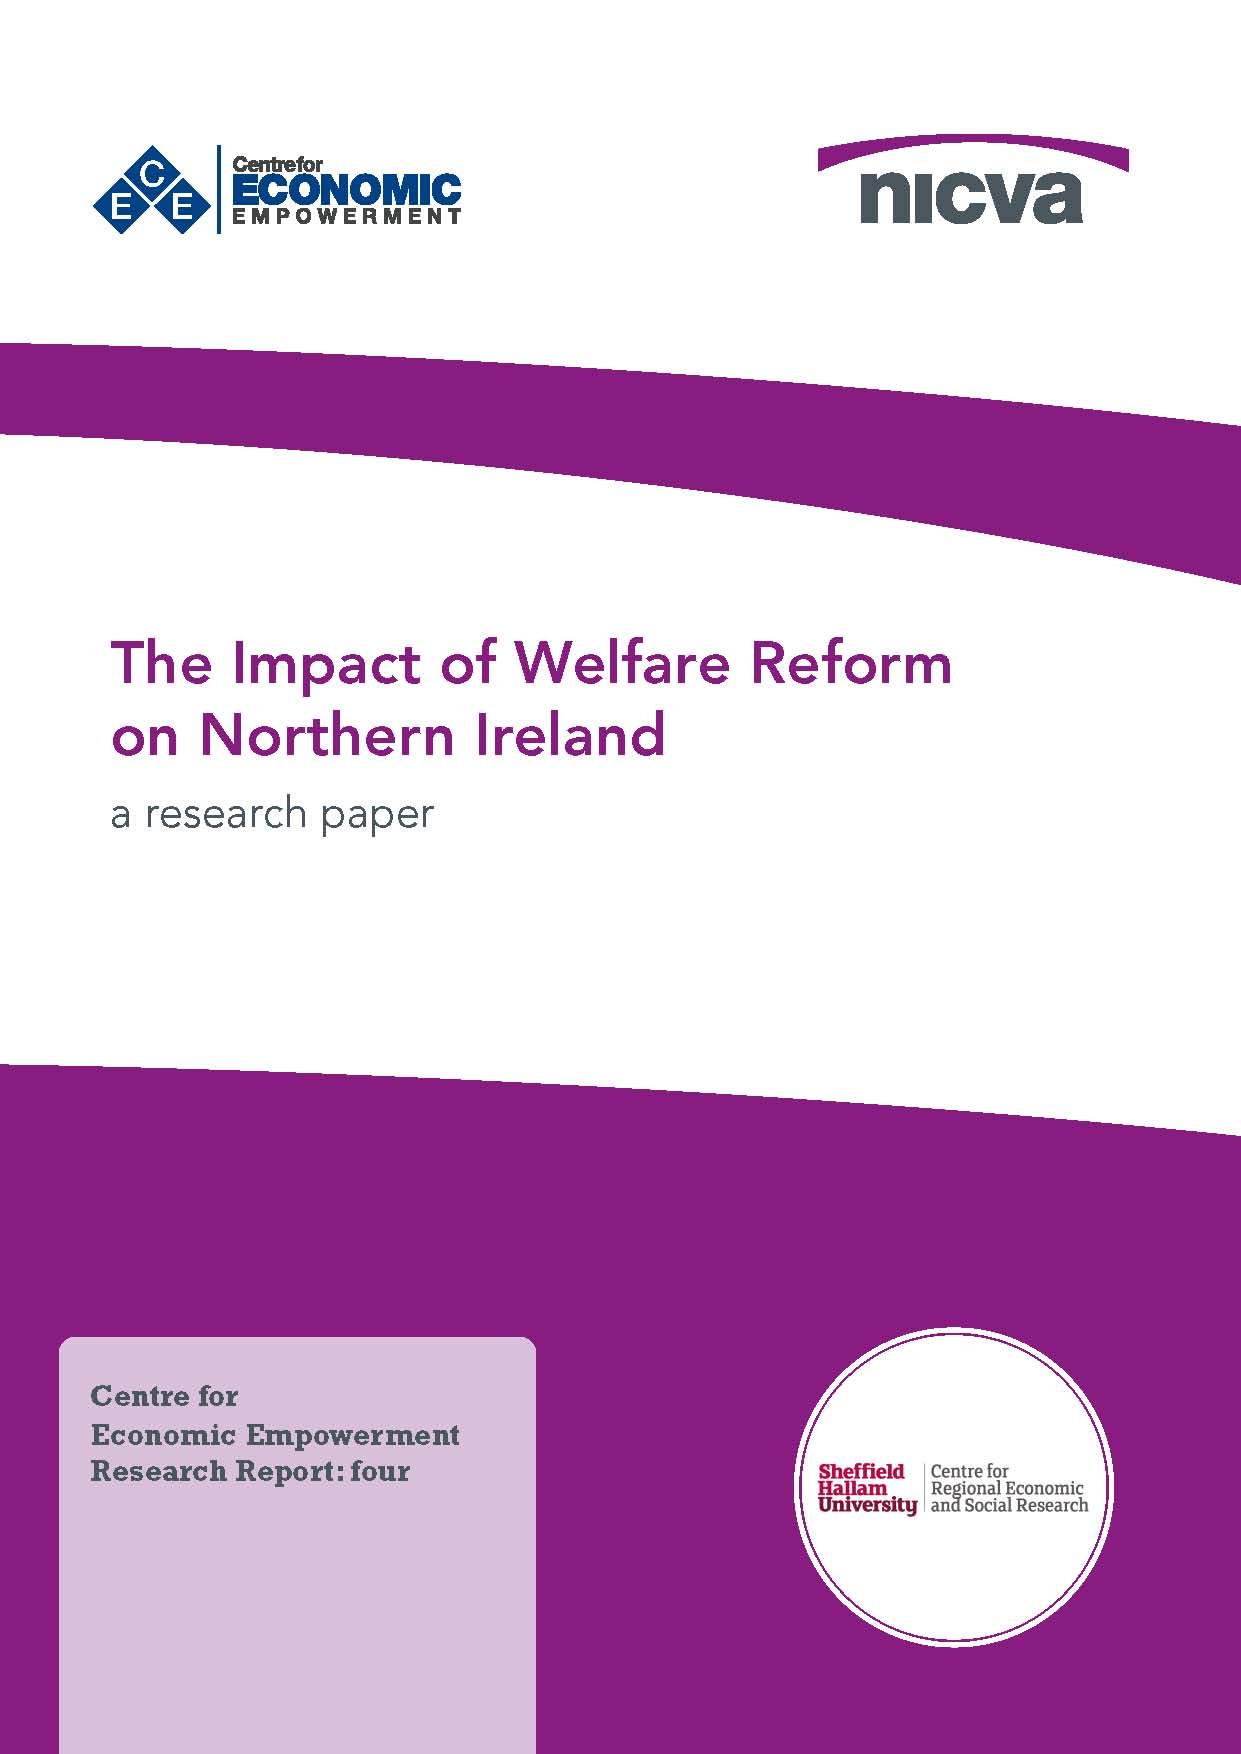 The Impact of Welfare Reform on Northern Ireland   NICVA